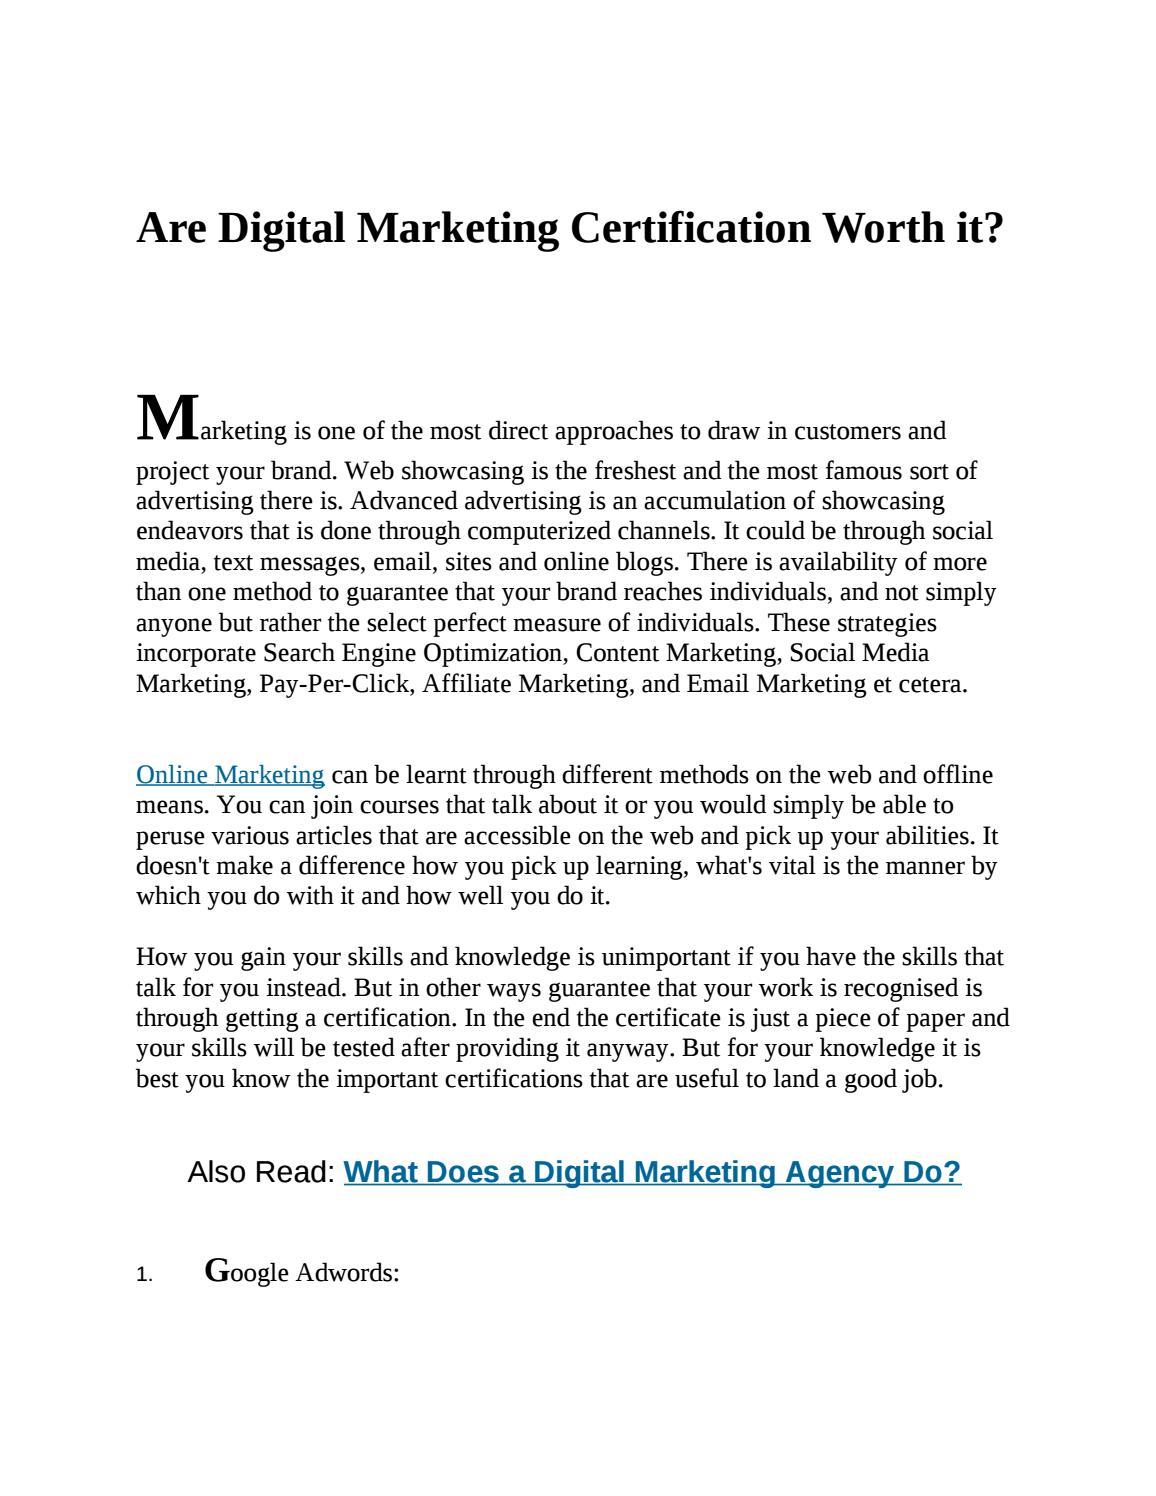 Are Digital Marketing Certification Worth It By Sunny Joshi Issuu